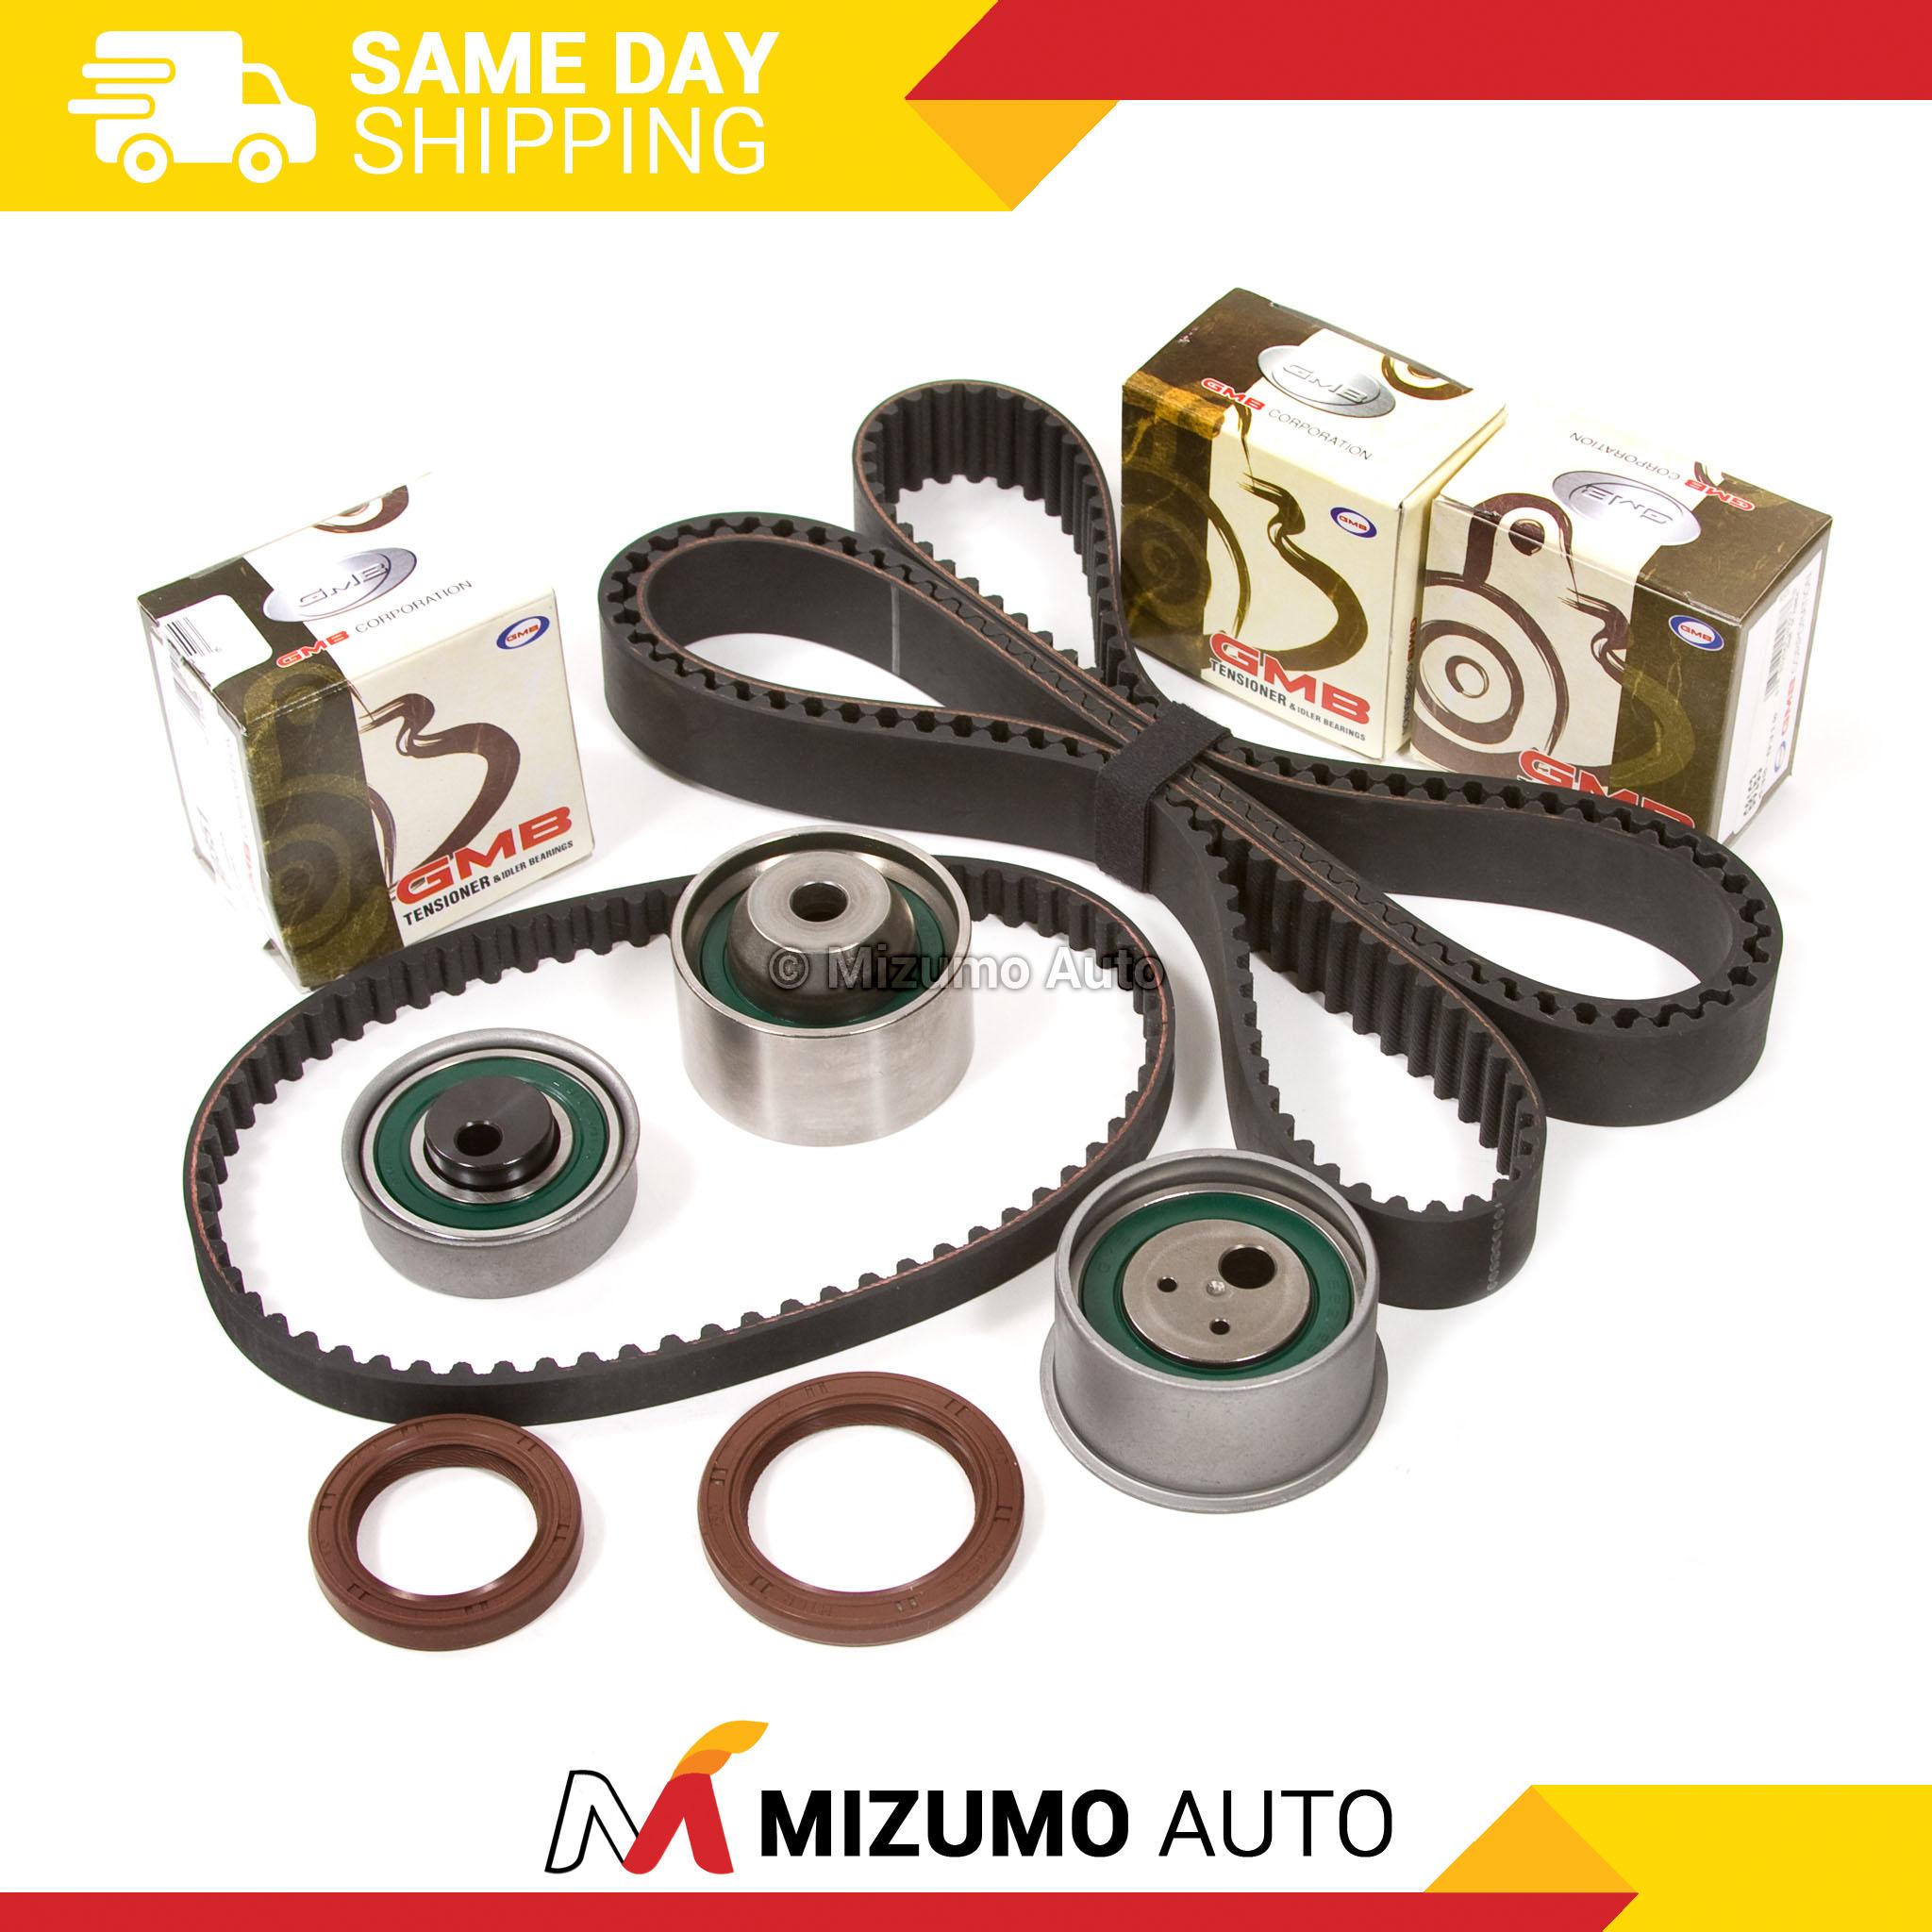 Timing-Belt-Kit-Fit-00-05-Mitsubishi-Galant-Eclipse-2-4L-SOHC-4G64